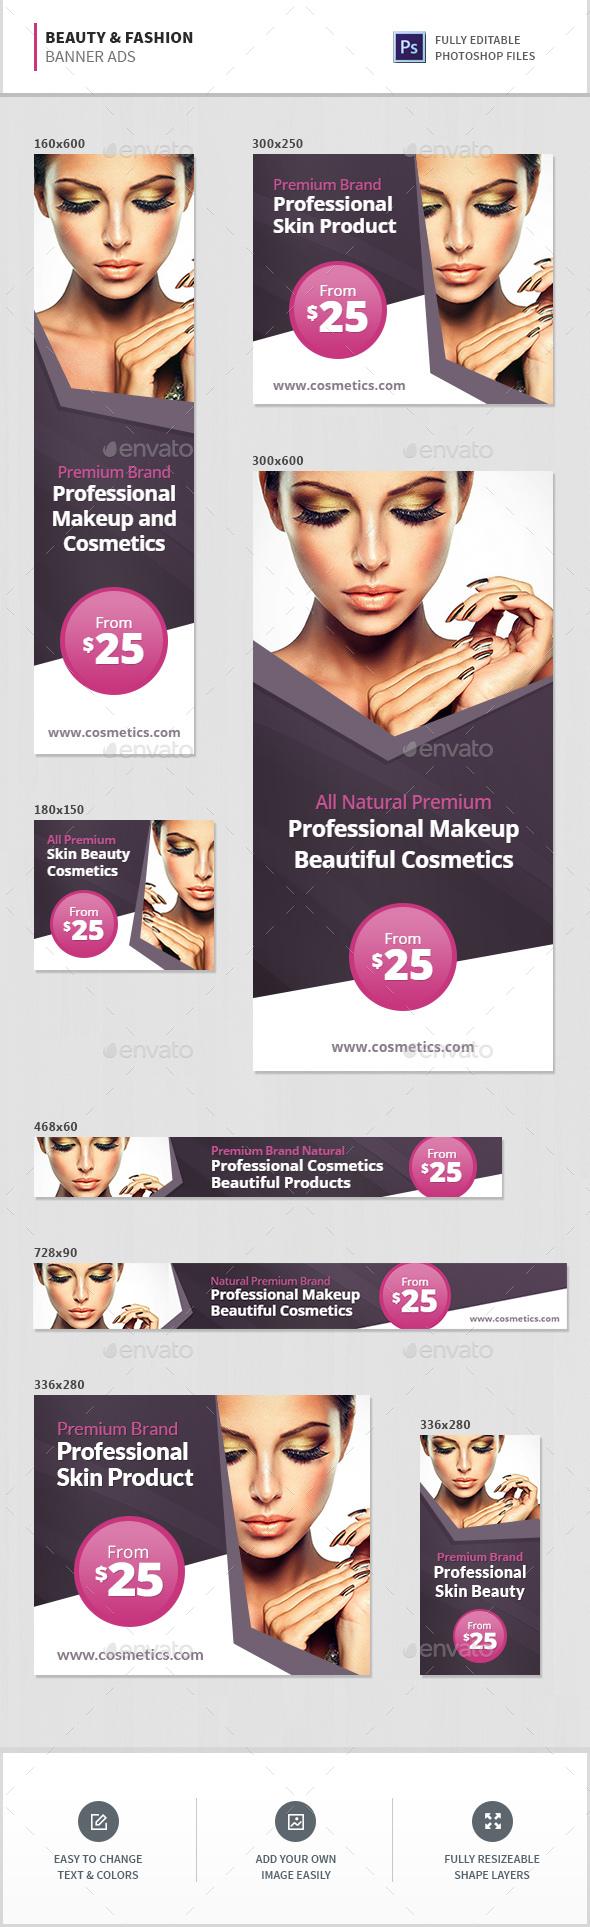 Beauty & Fashion Banner Ads